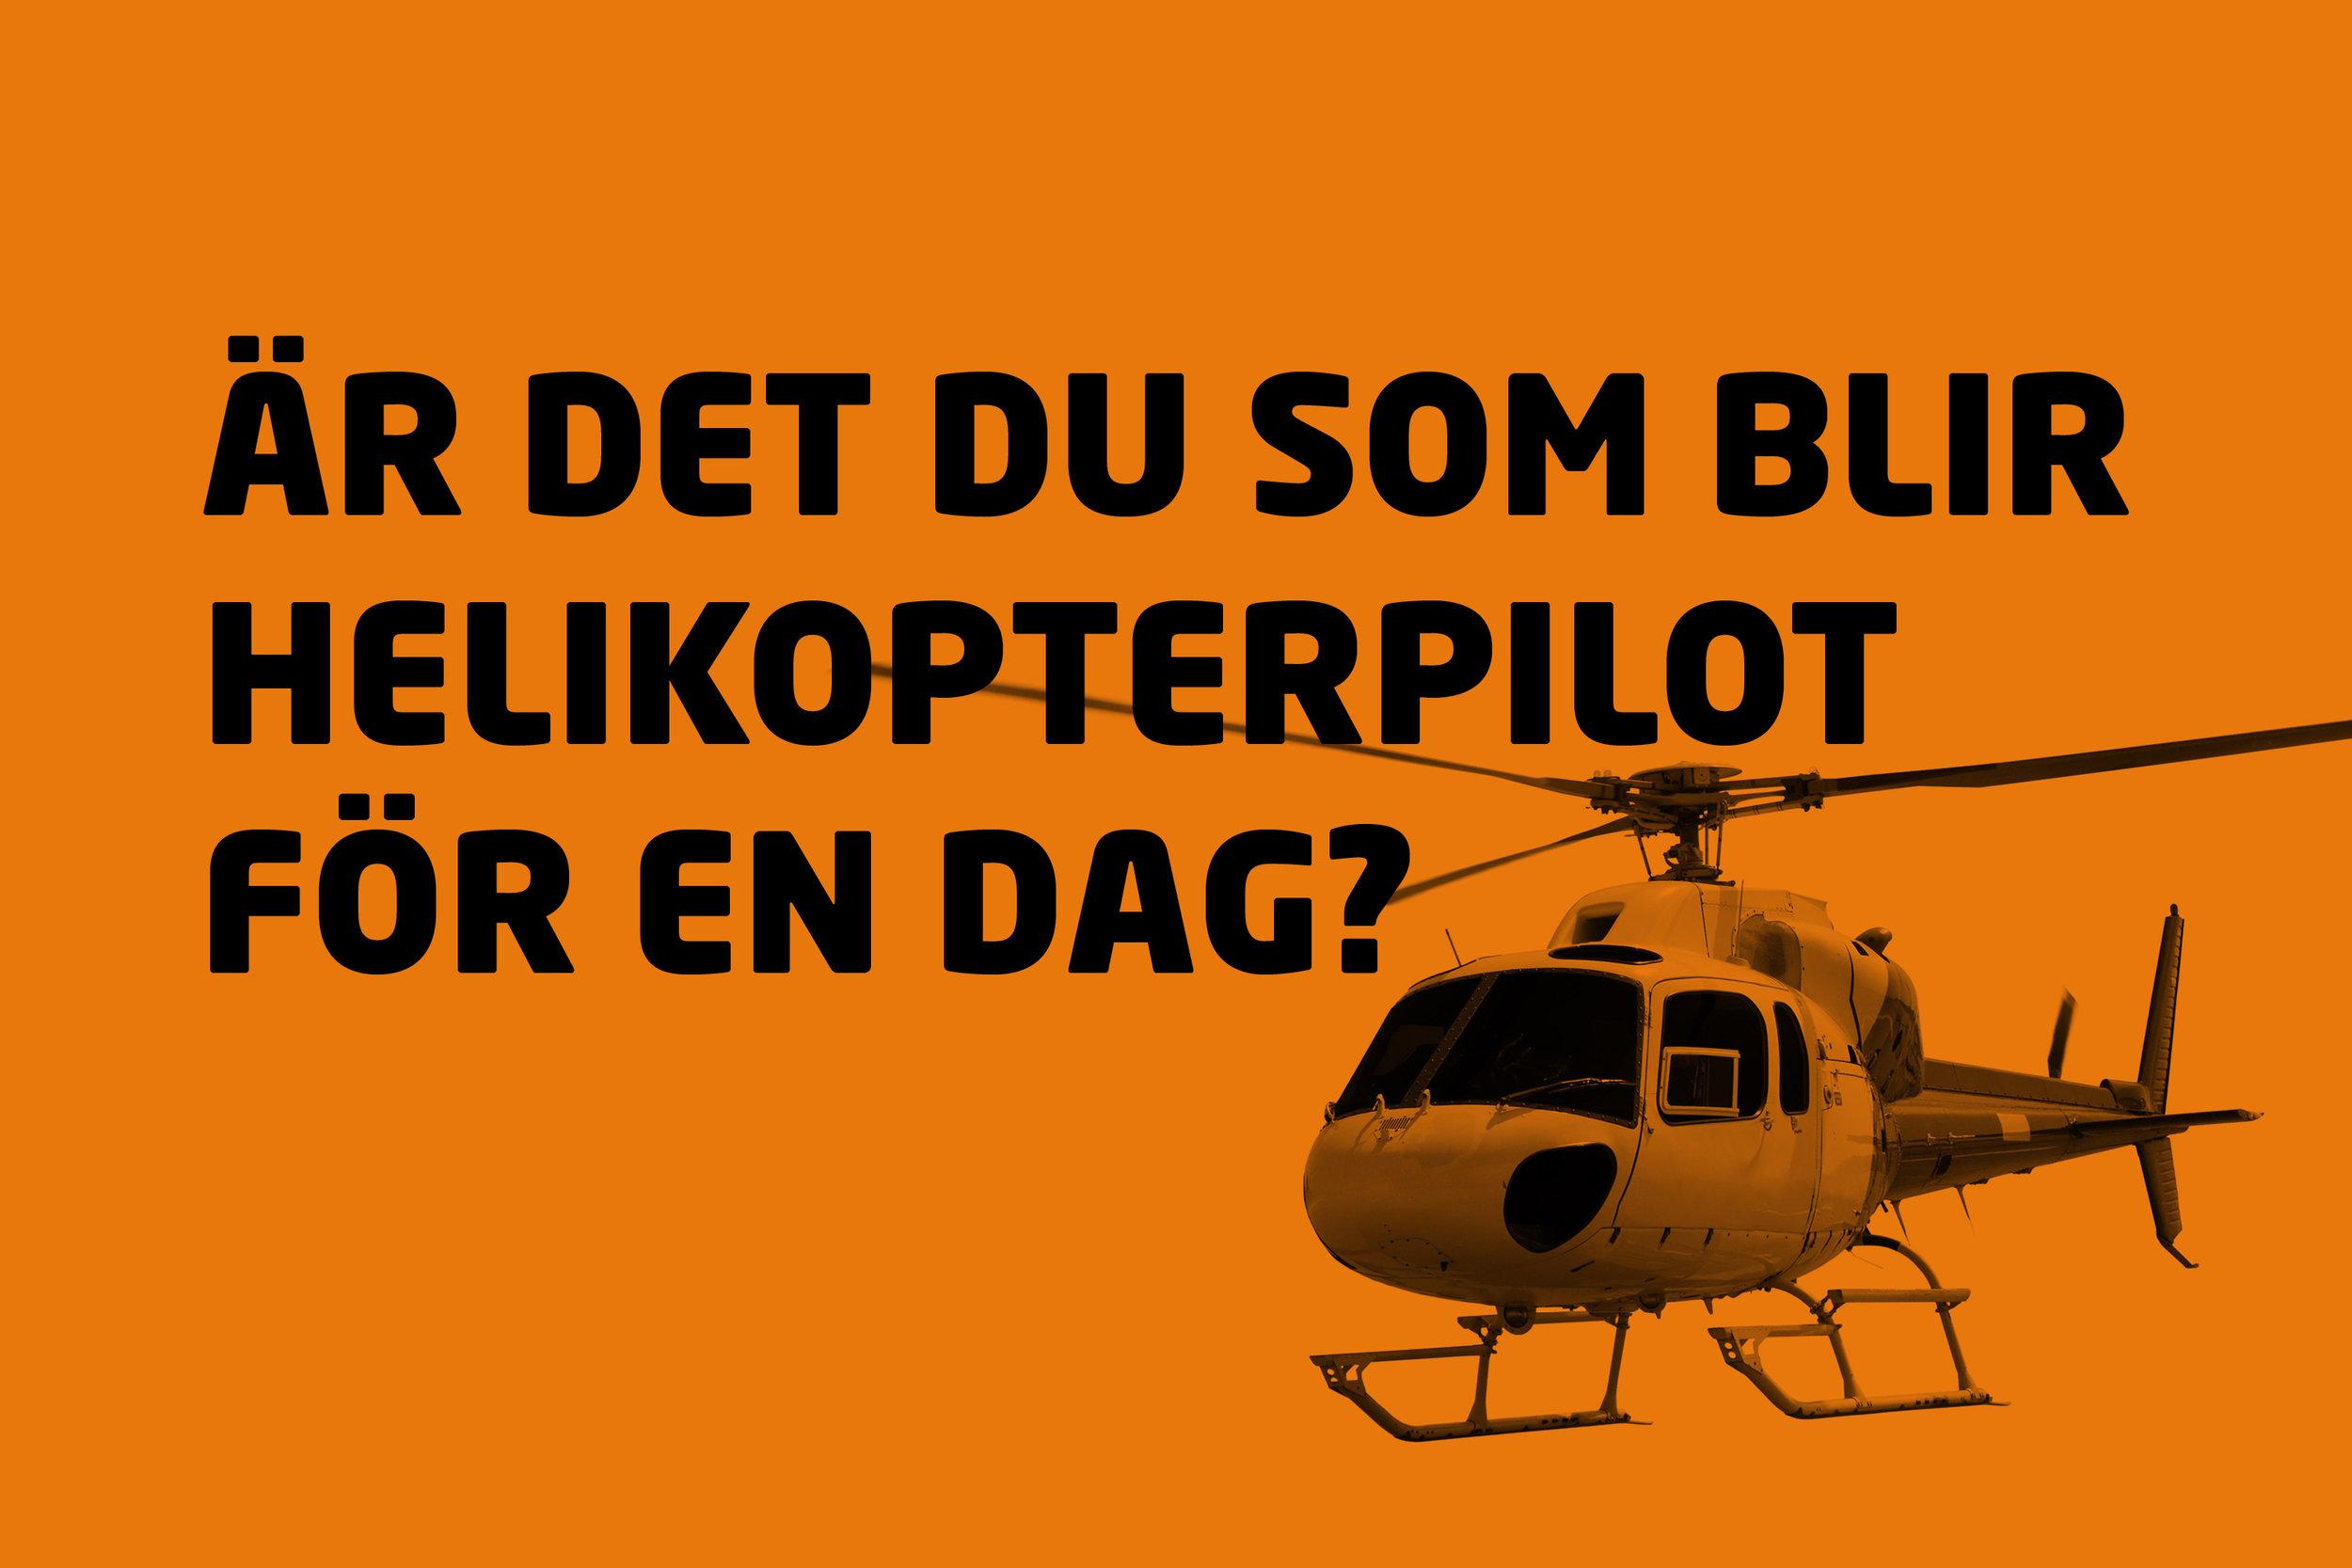 Helikopterpilot för en dag